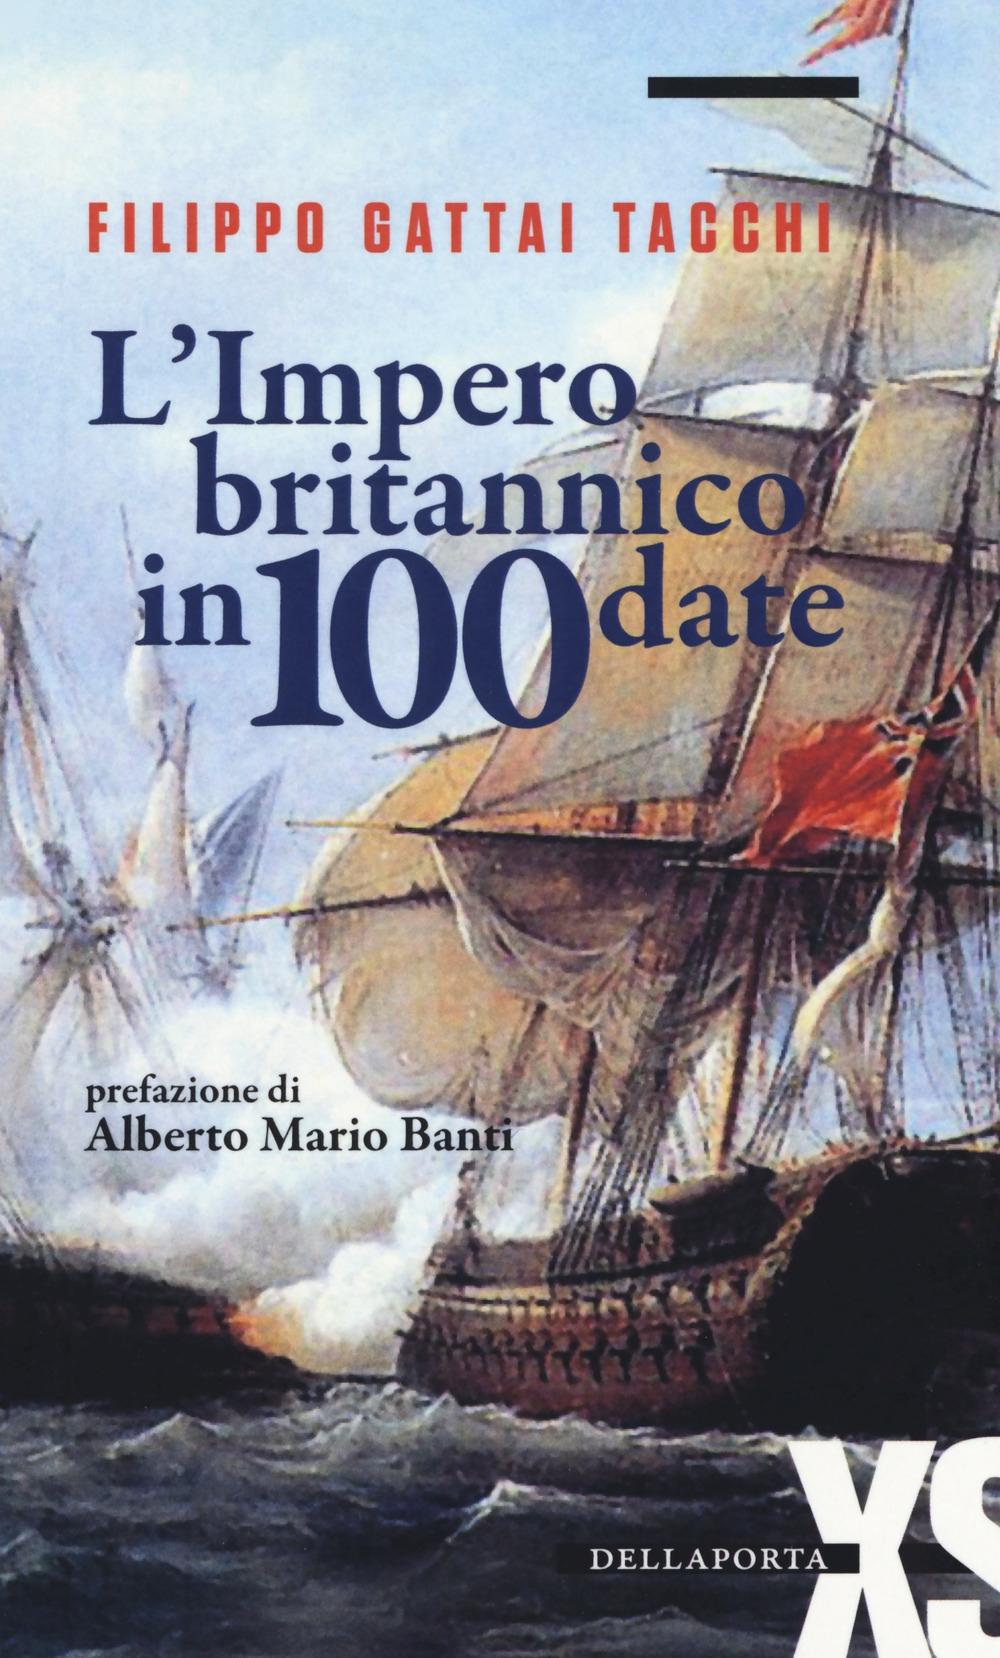 L'impero britannico in 100 date